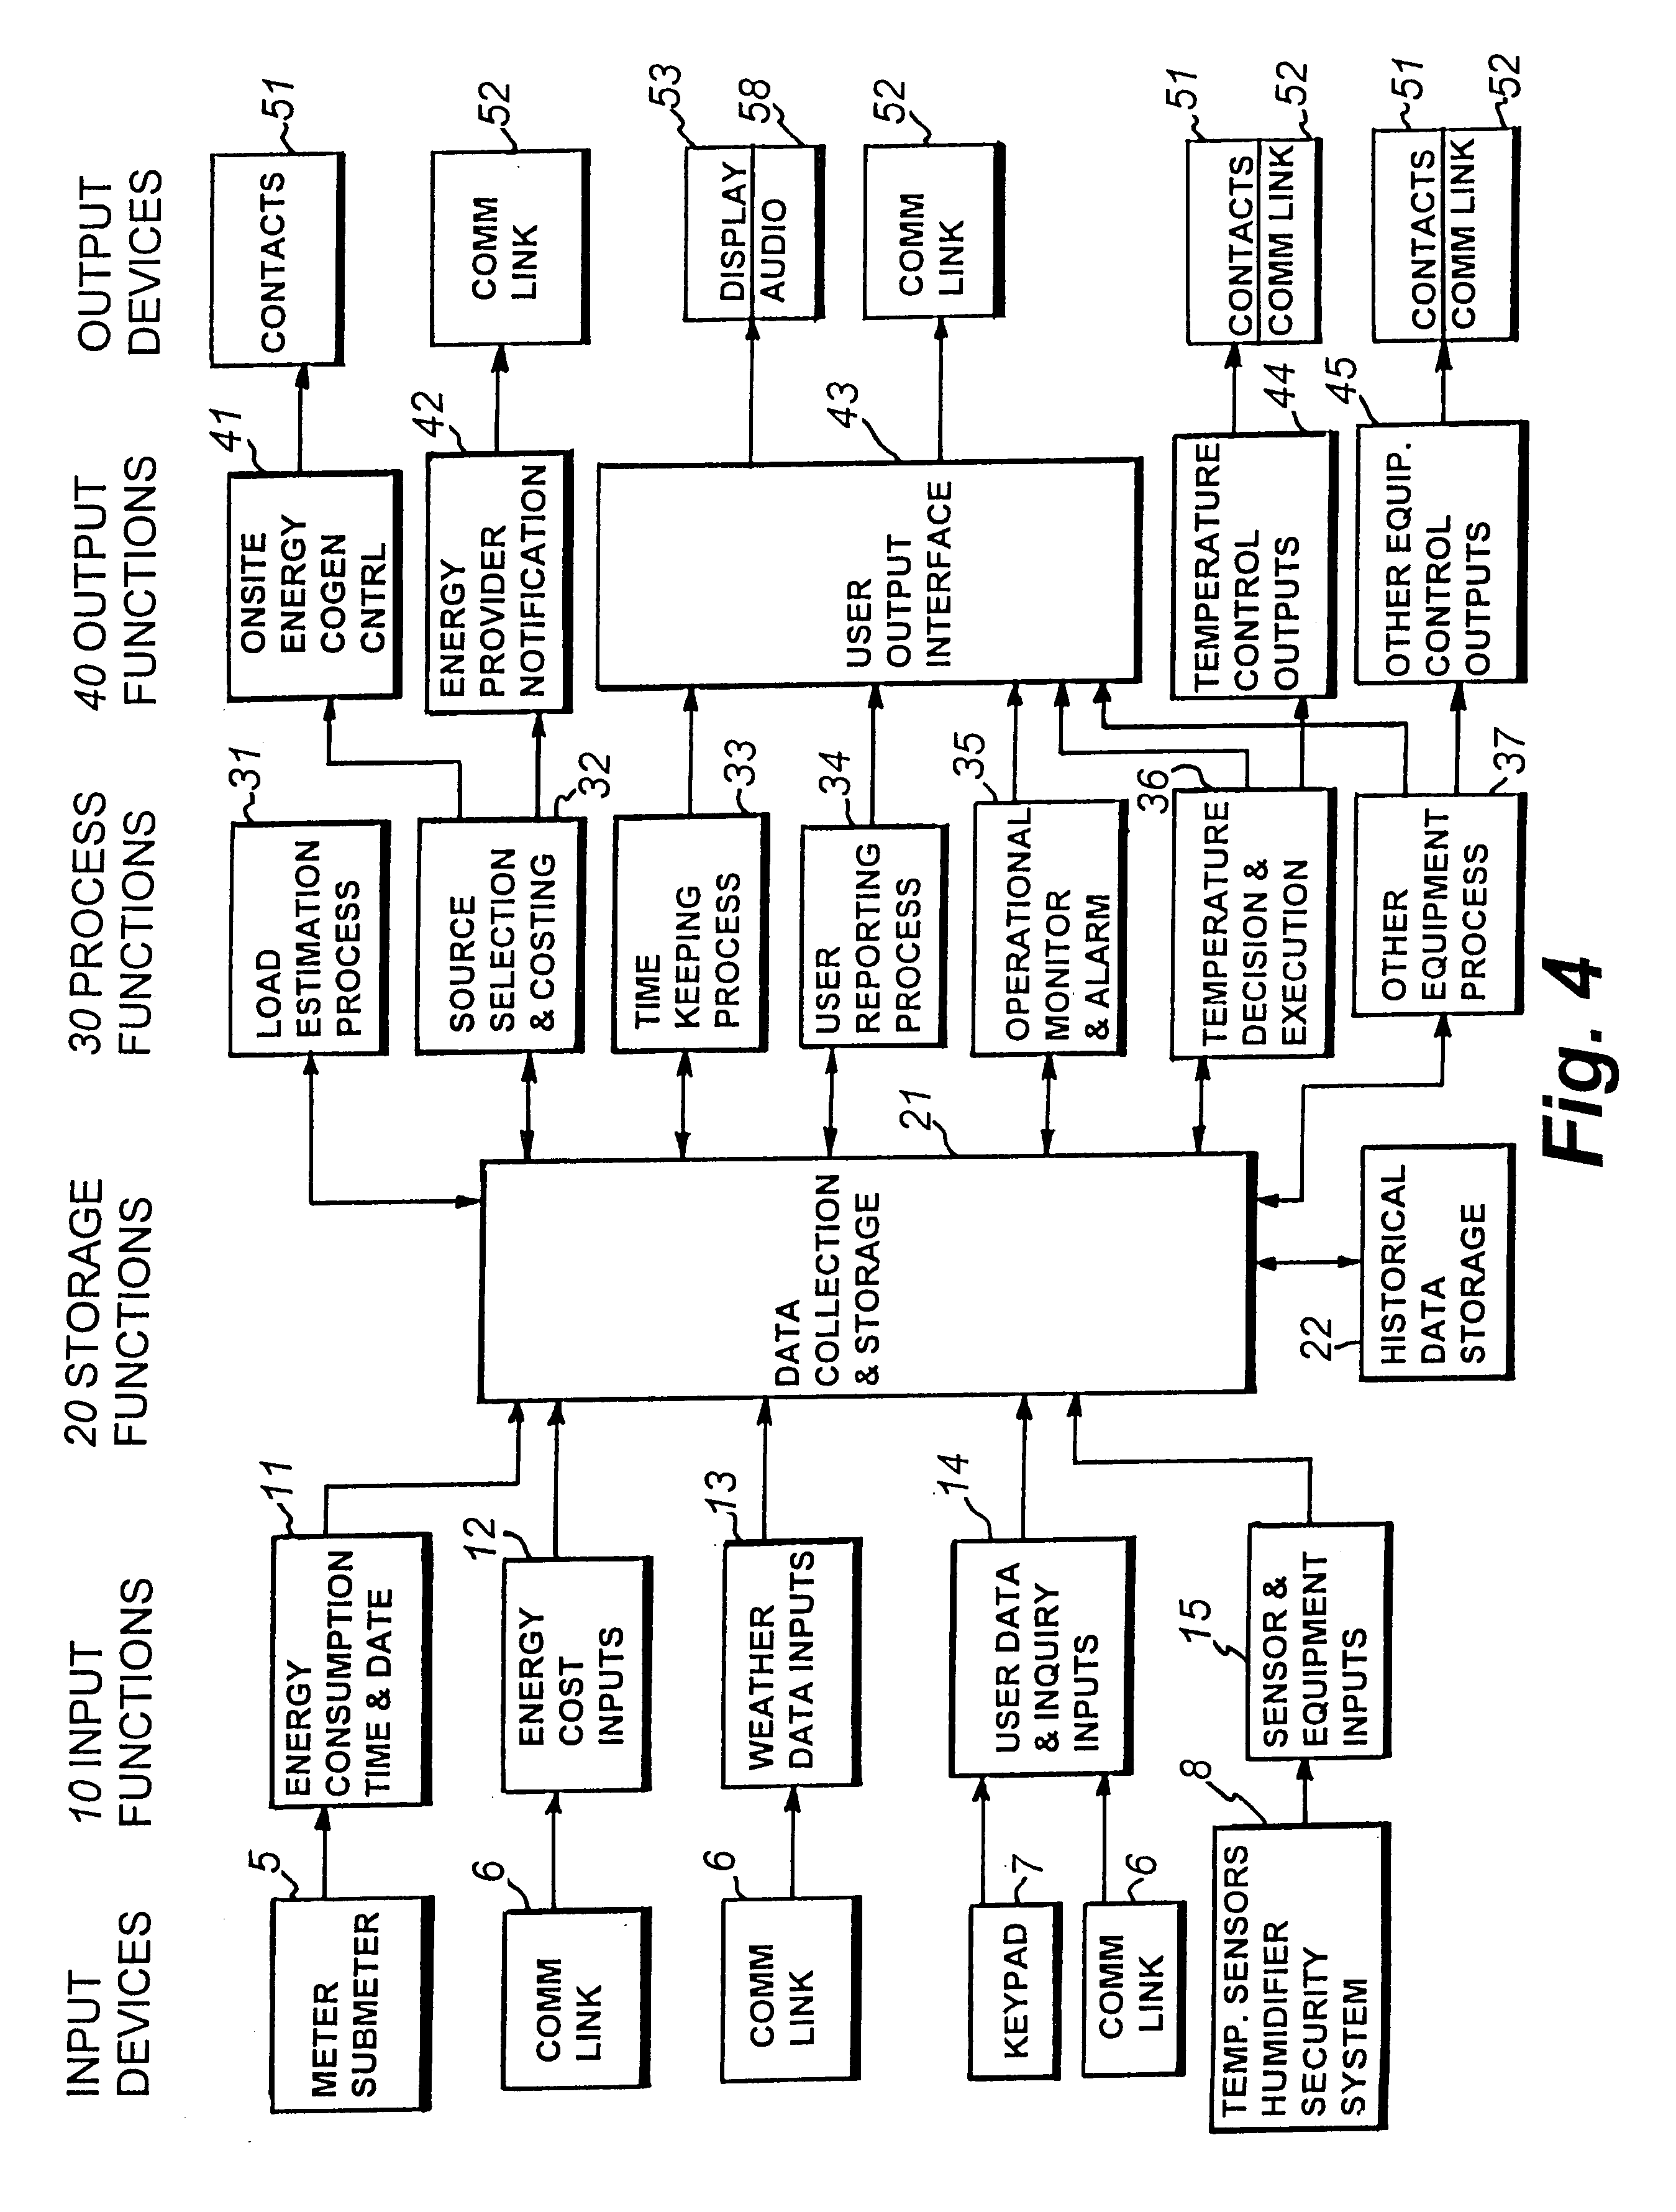 Patent Us 6216956 B1 Block Diagram Sbd Power Over Ethernet Ticom 0 Petitions